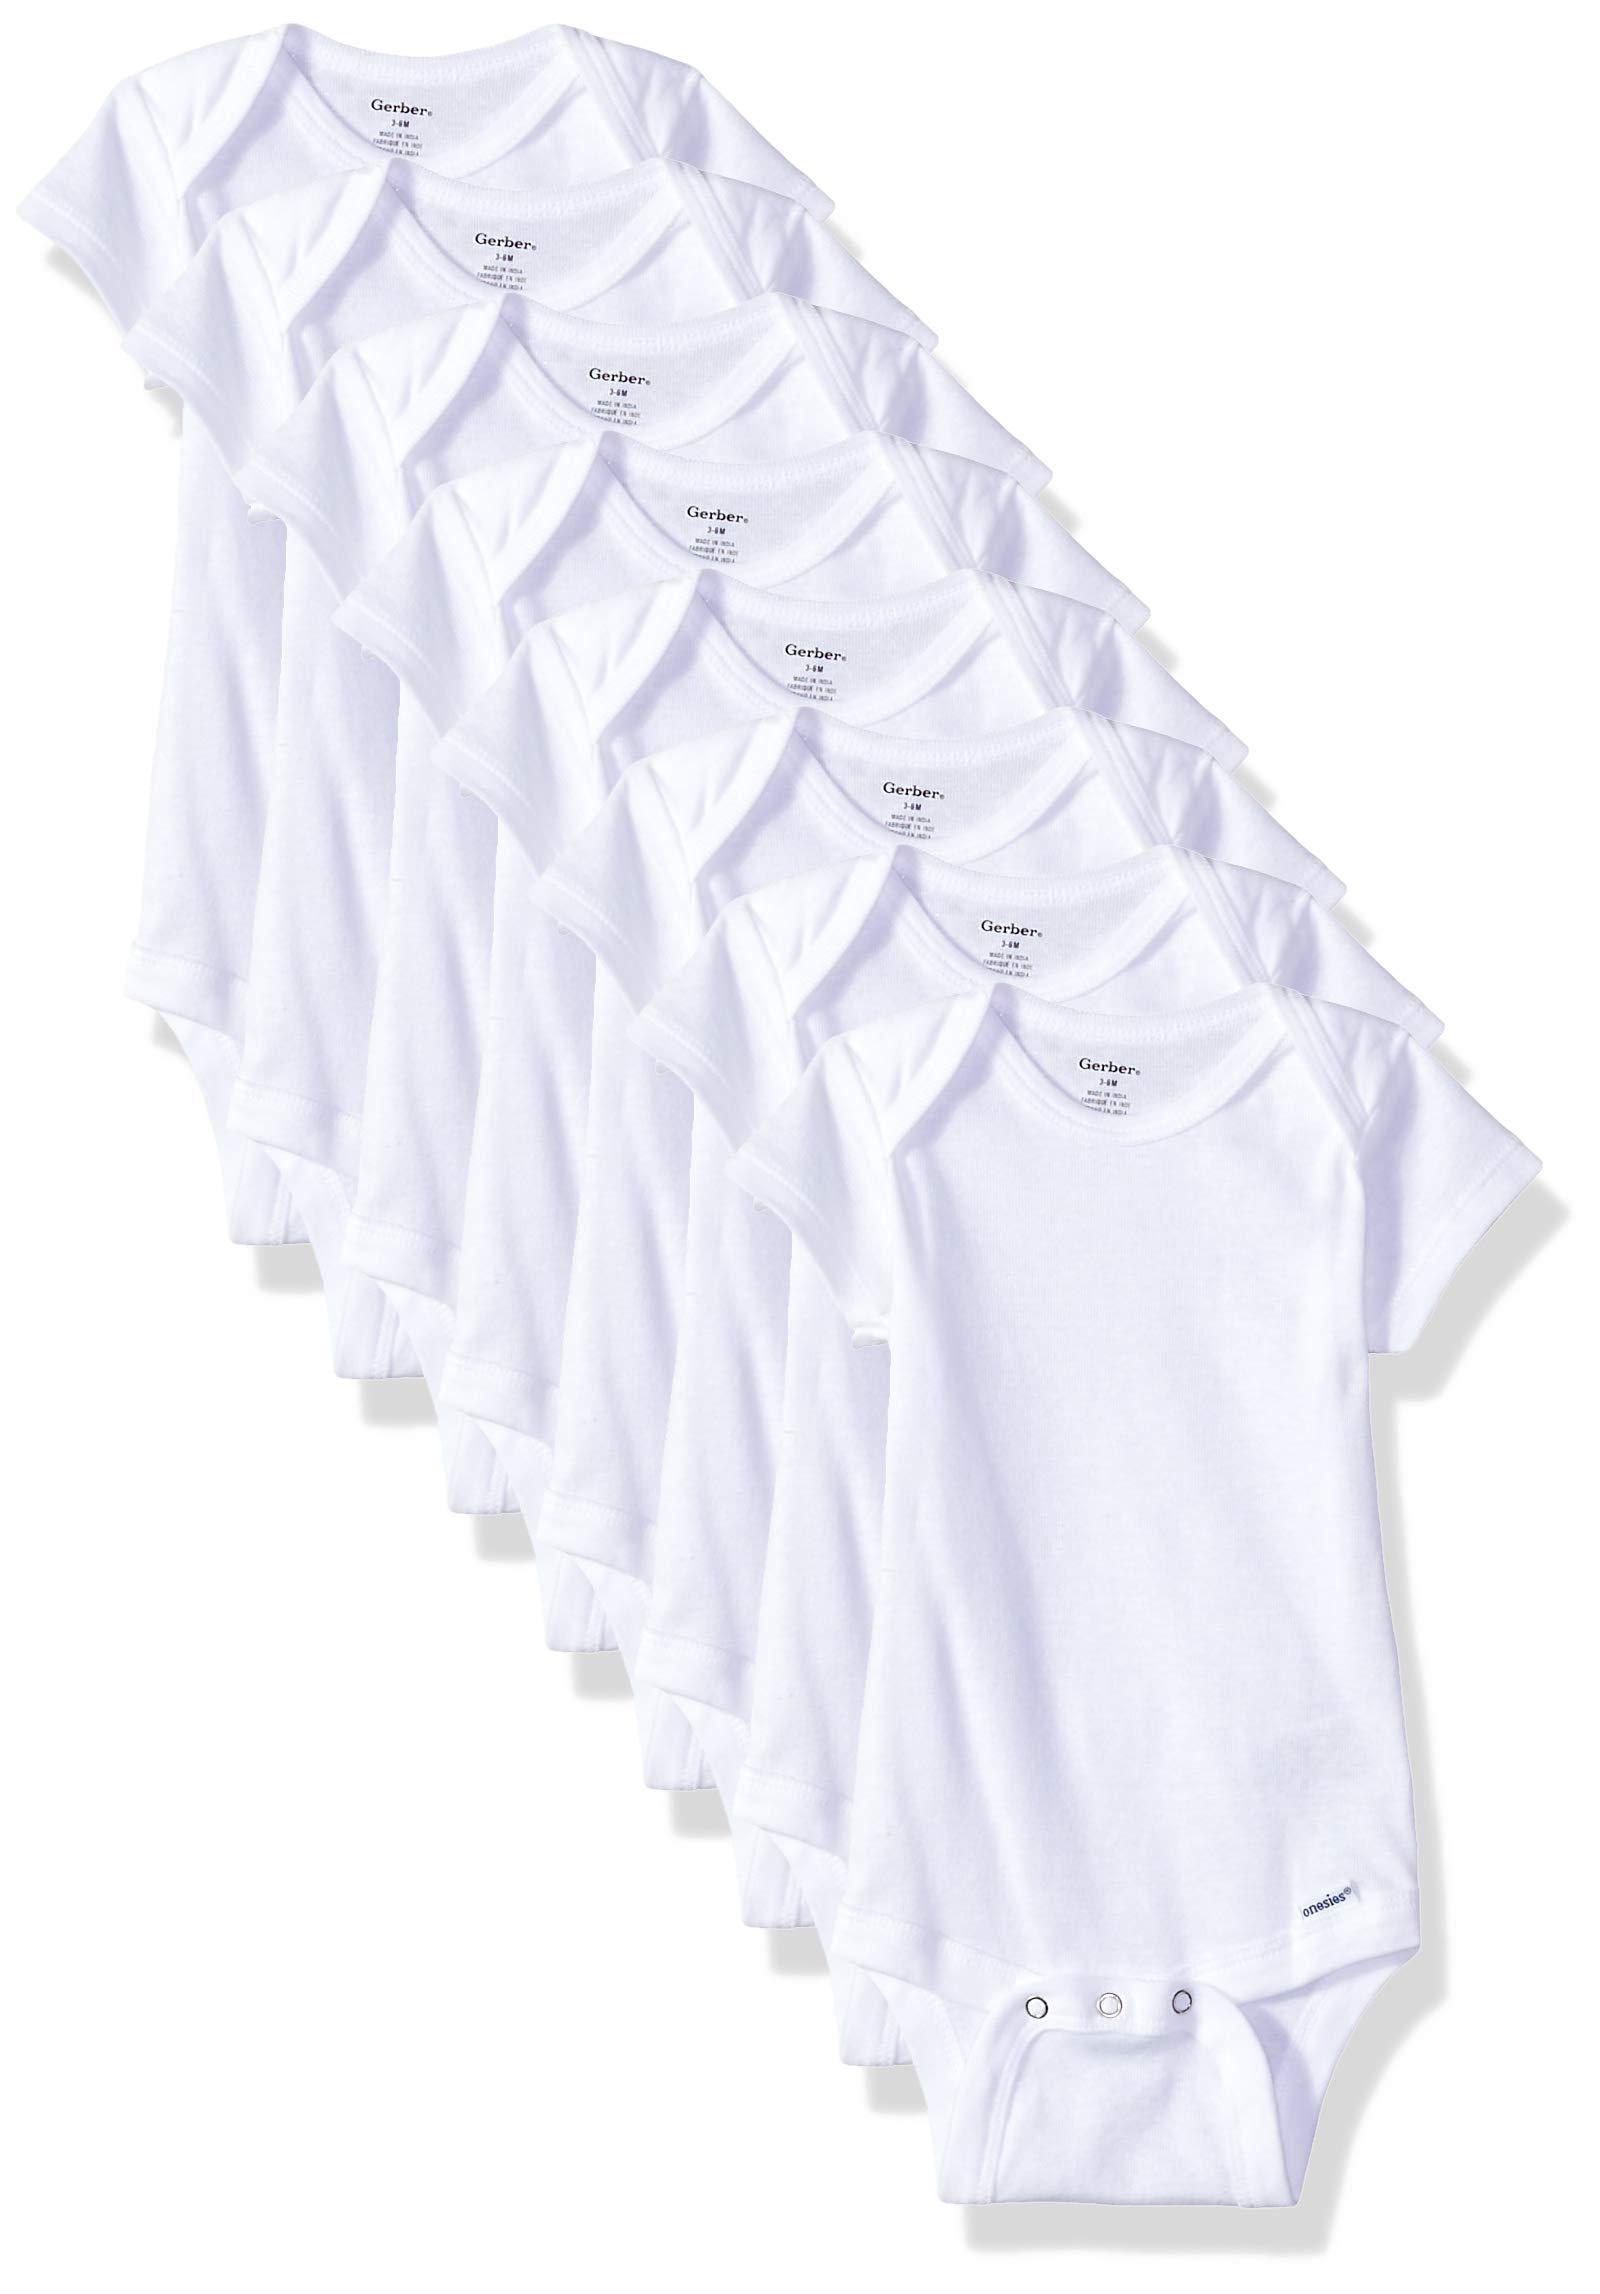 Gerber Baby 8-Pack Short-Sleeve Onesies Bodysuit, White, 0-3 Months